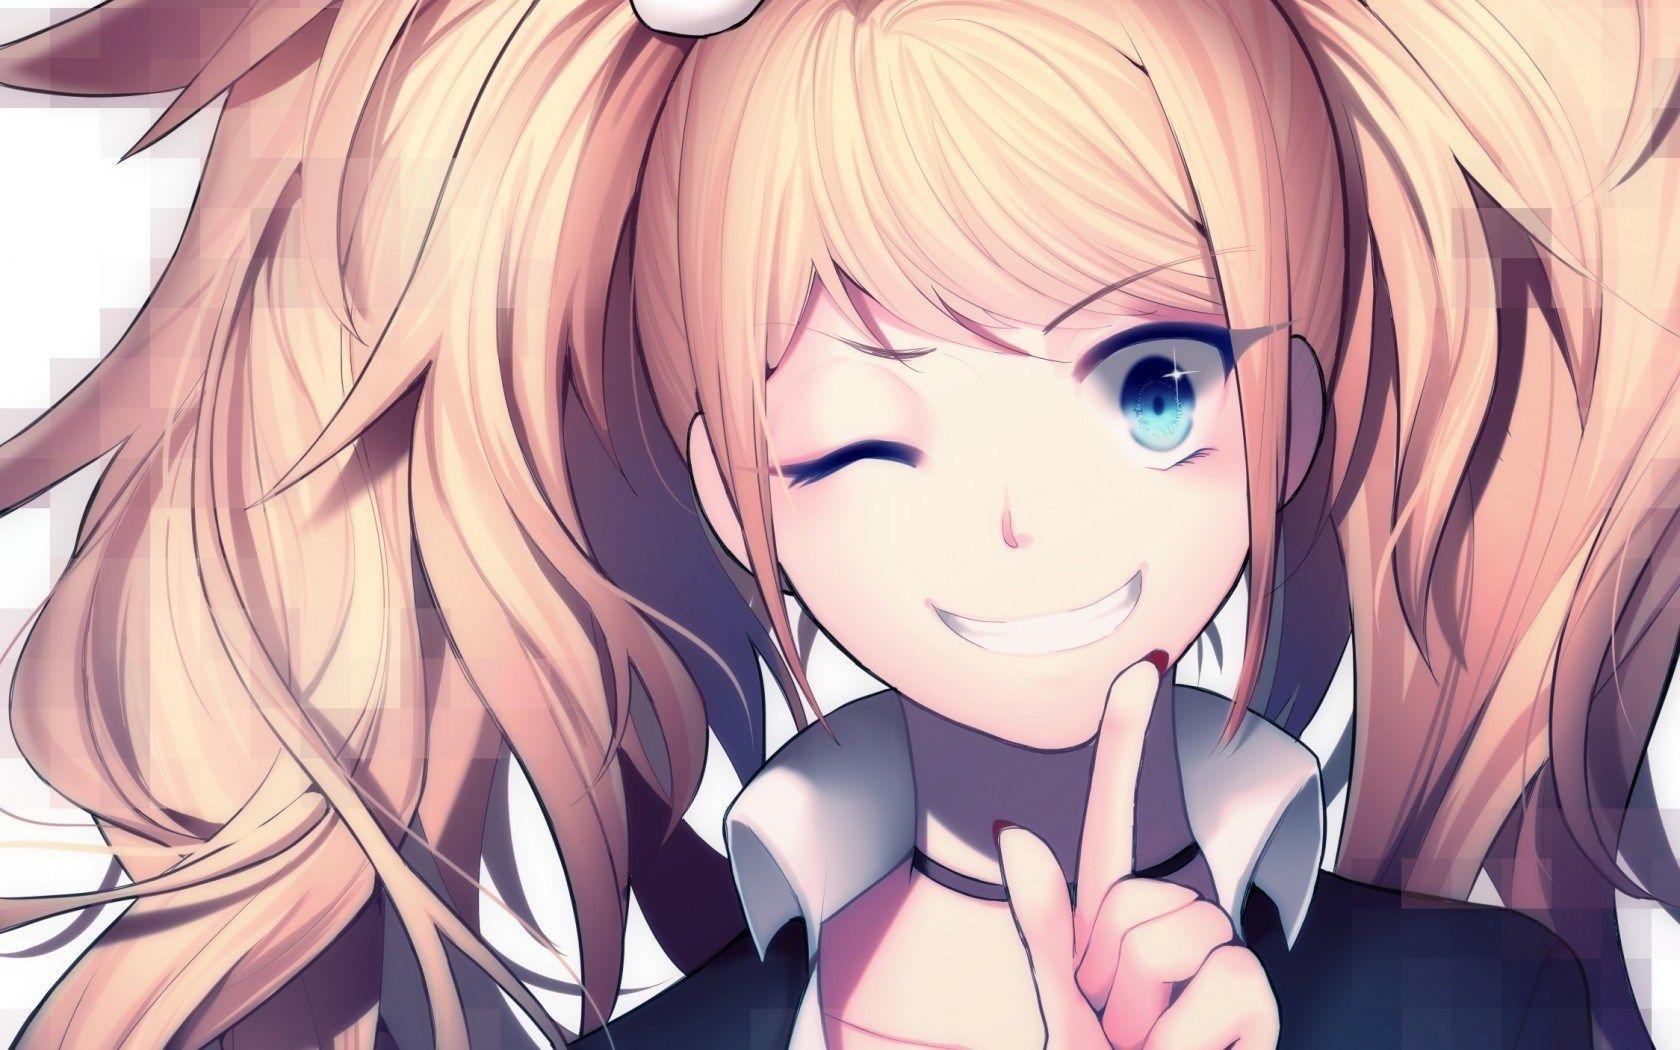 anime girl cool, cute, art, chest, beautiful eyes, hat, hd